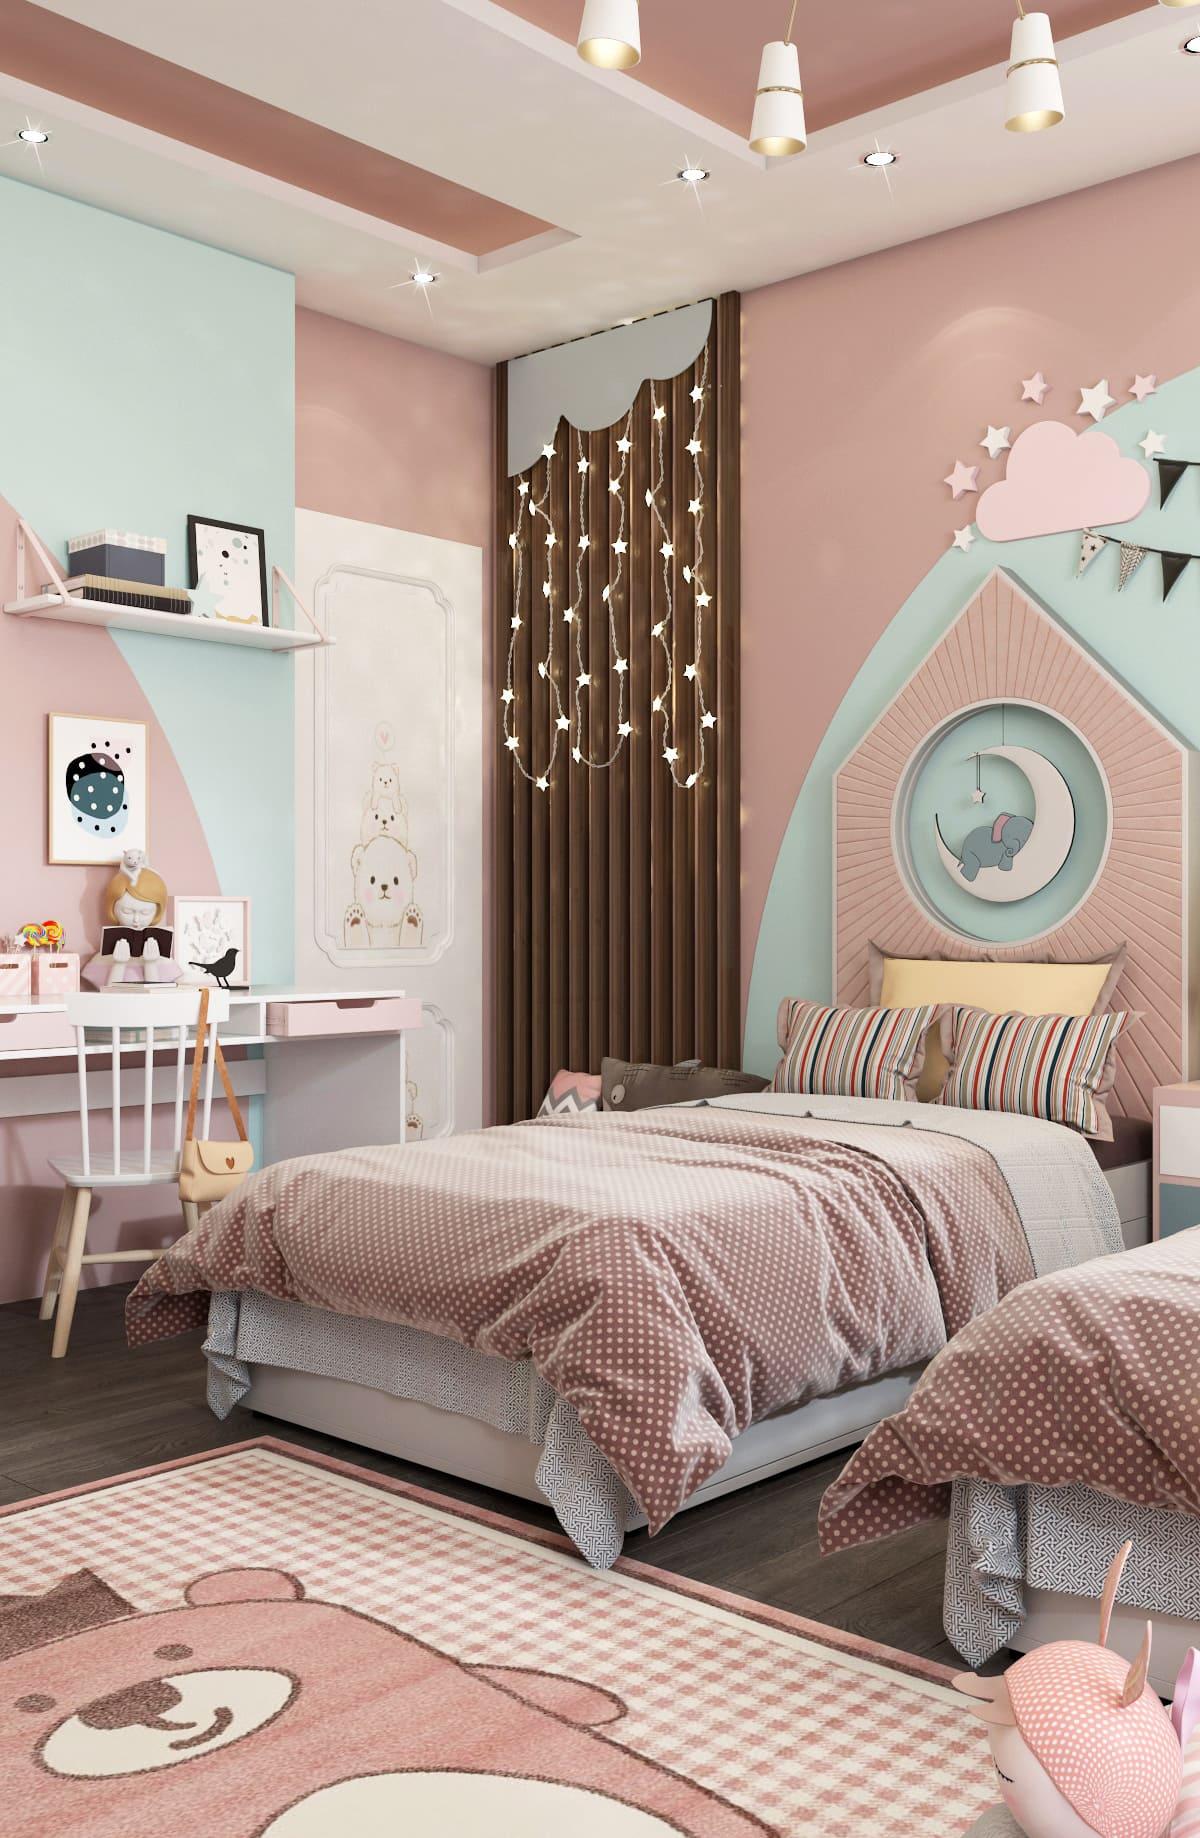 интерьер детской комнаты фото 89